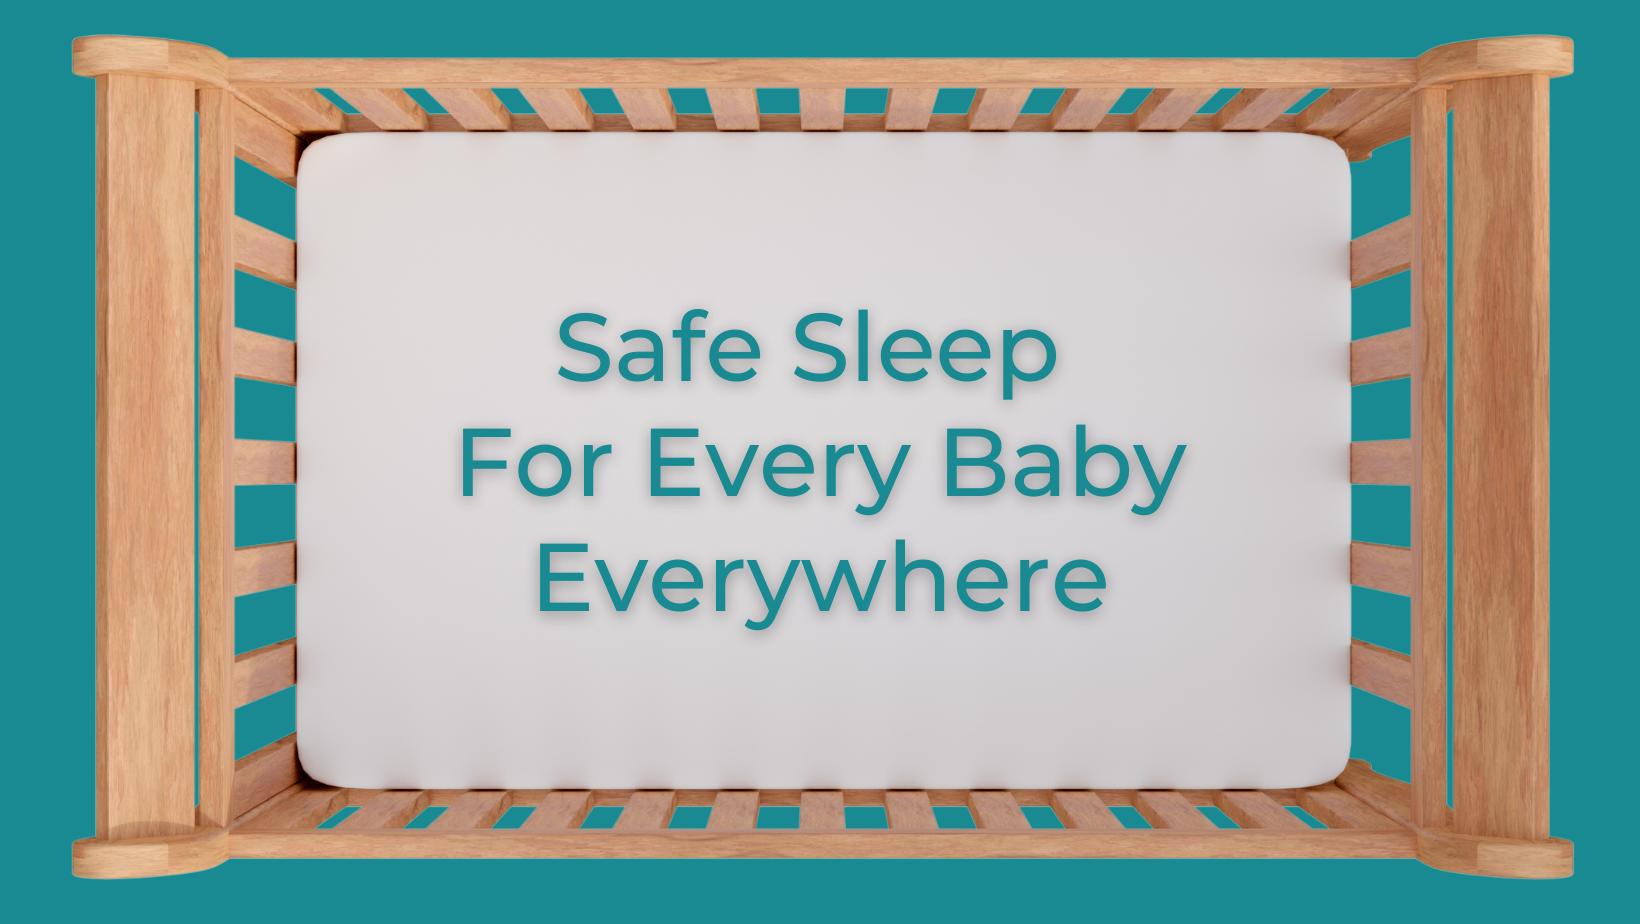 Safe Sleep for Every Baby Everywhere